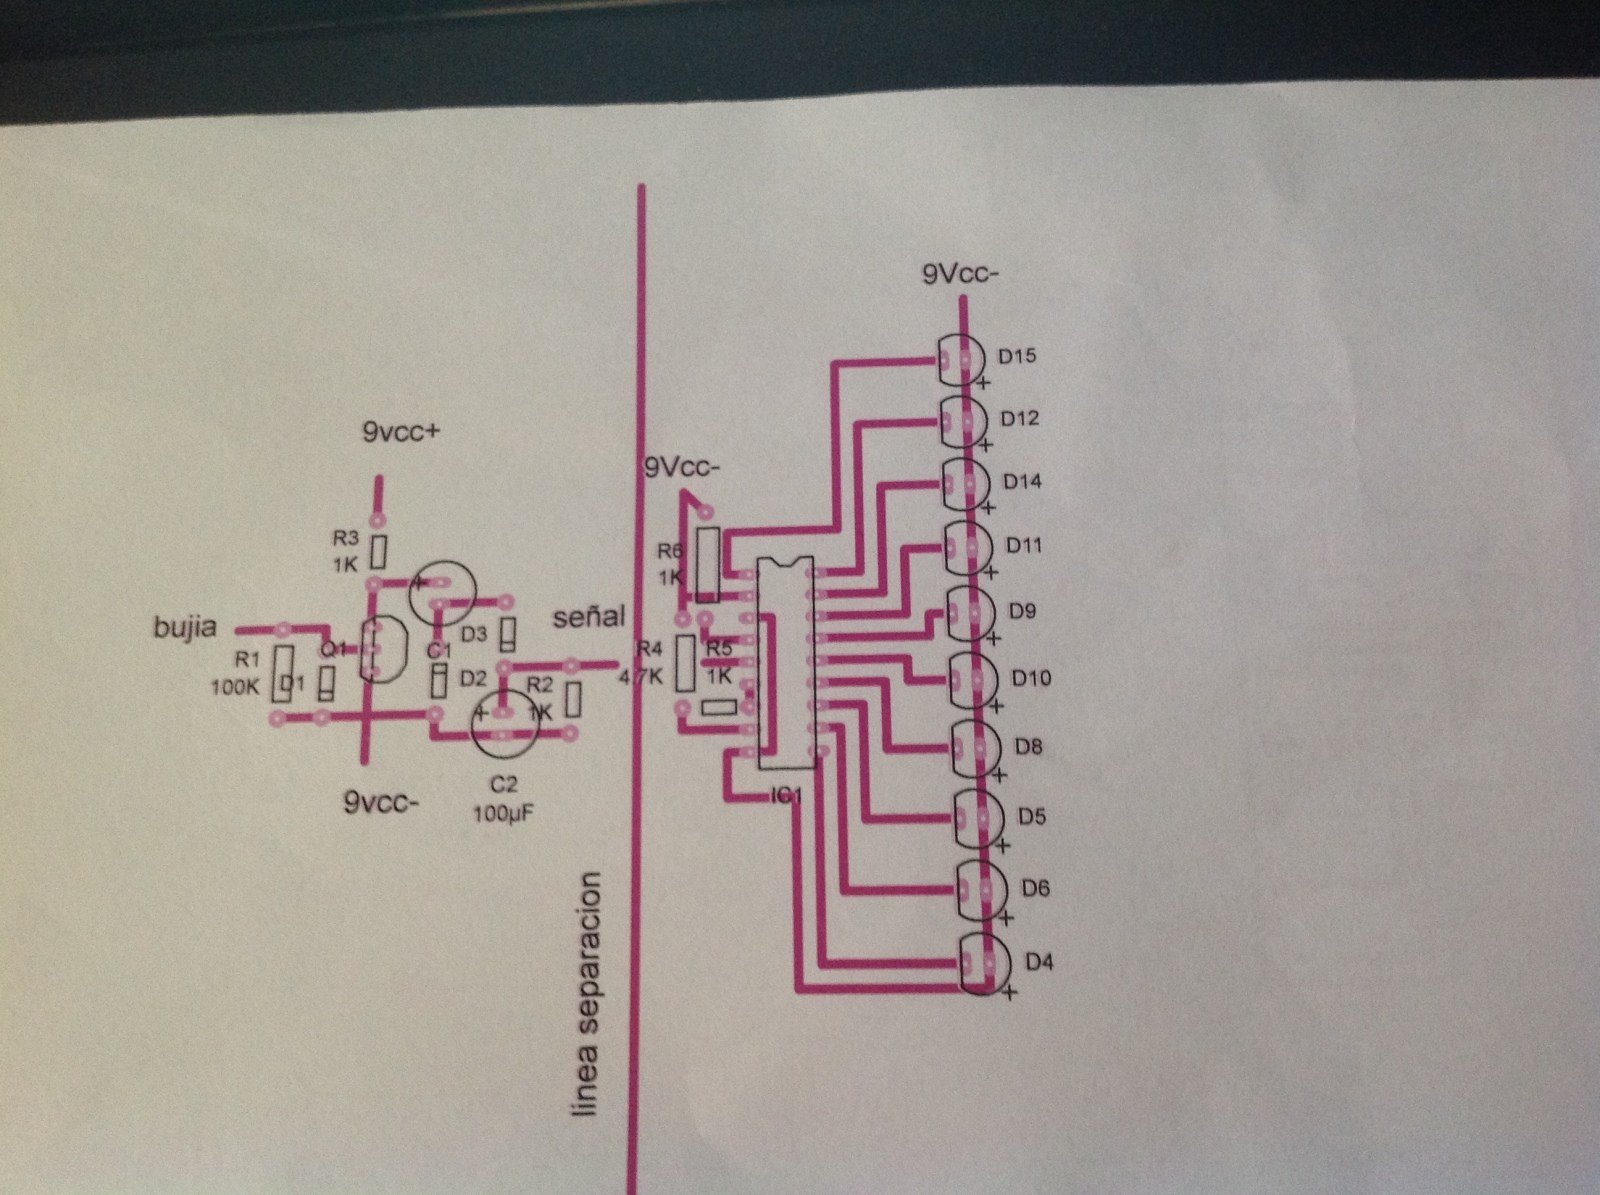 Tacómetro de LED,s casero 21juc8h